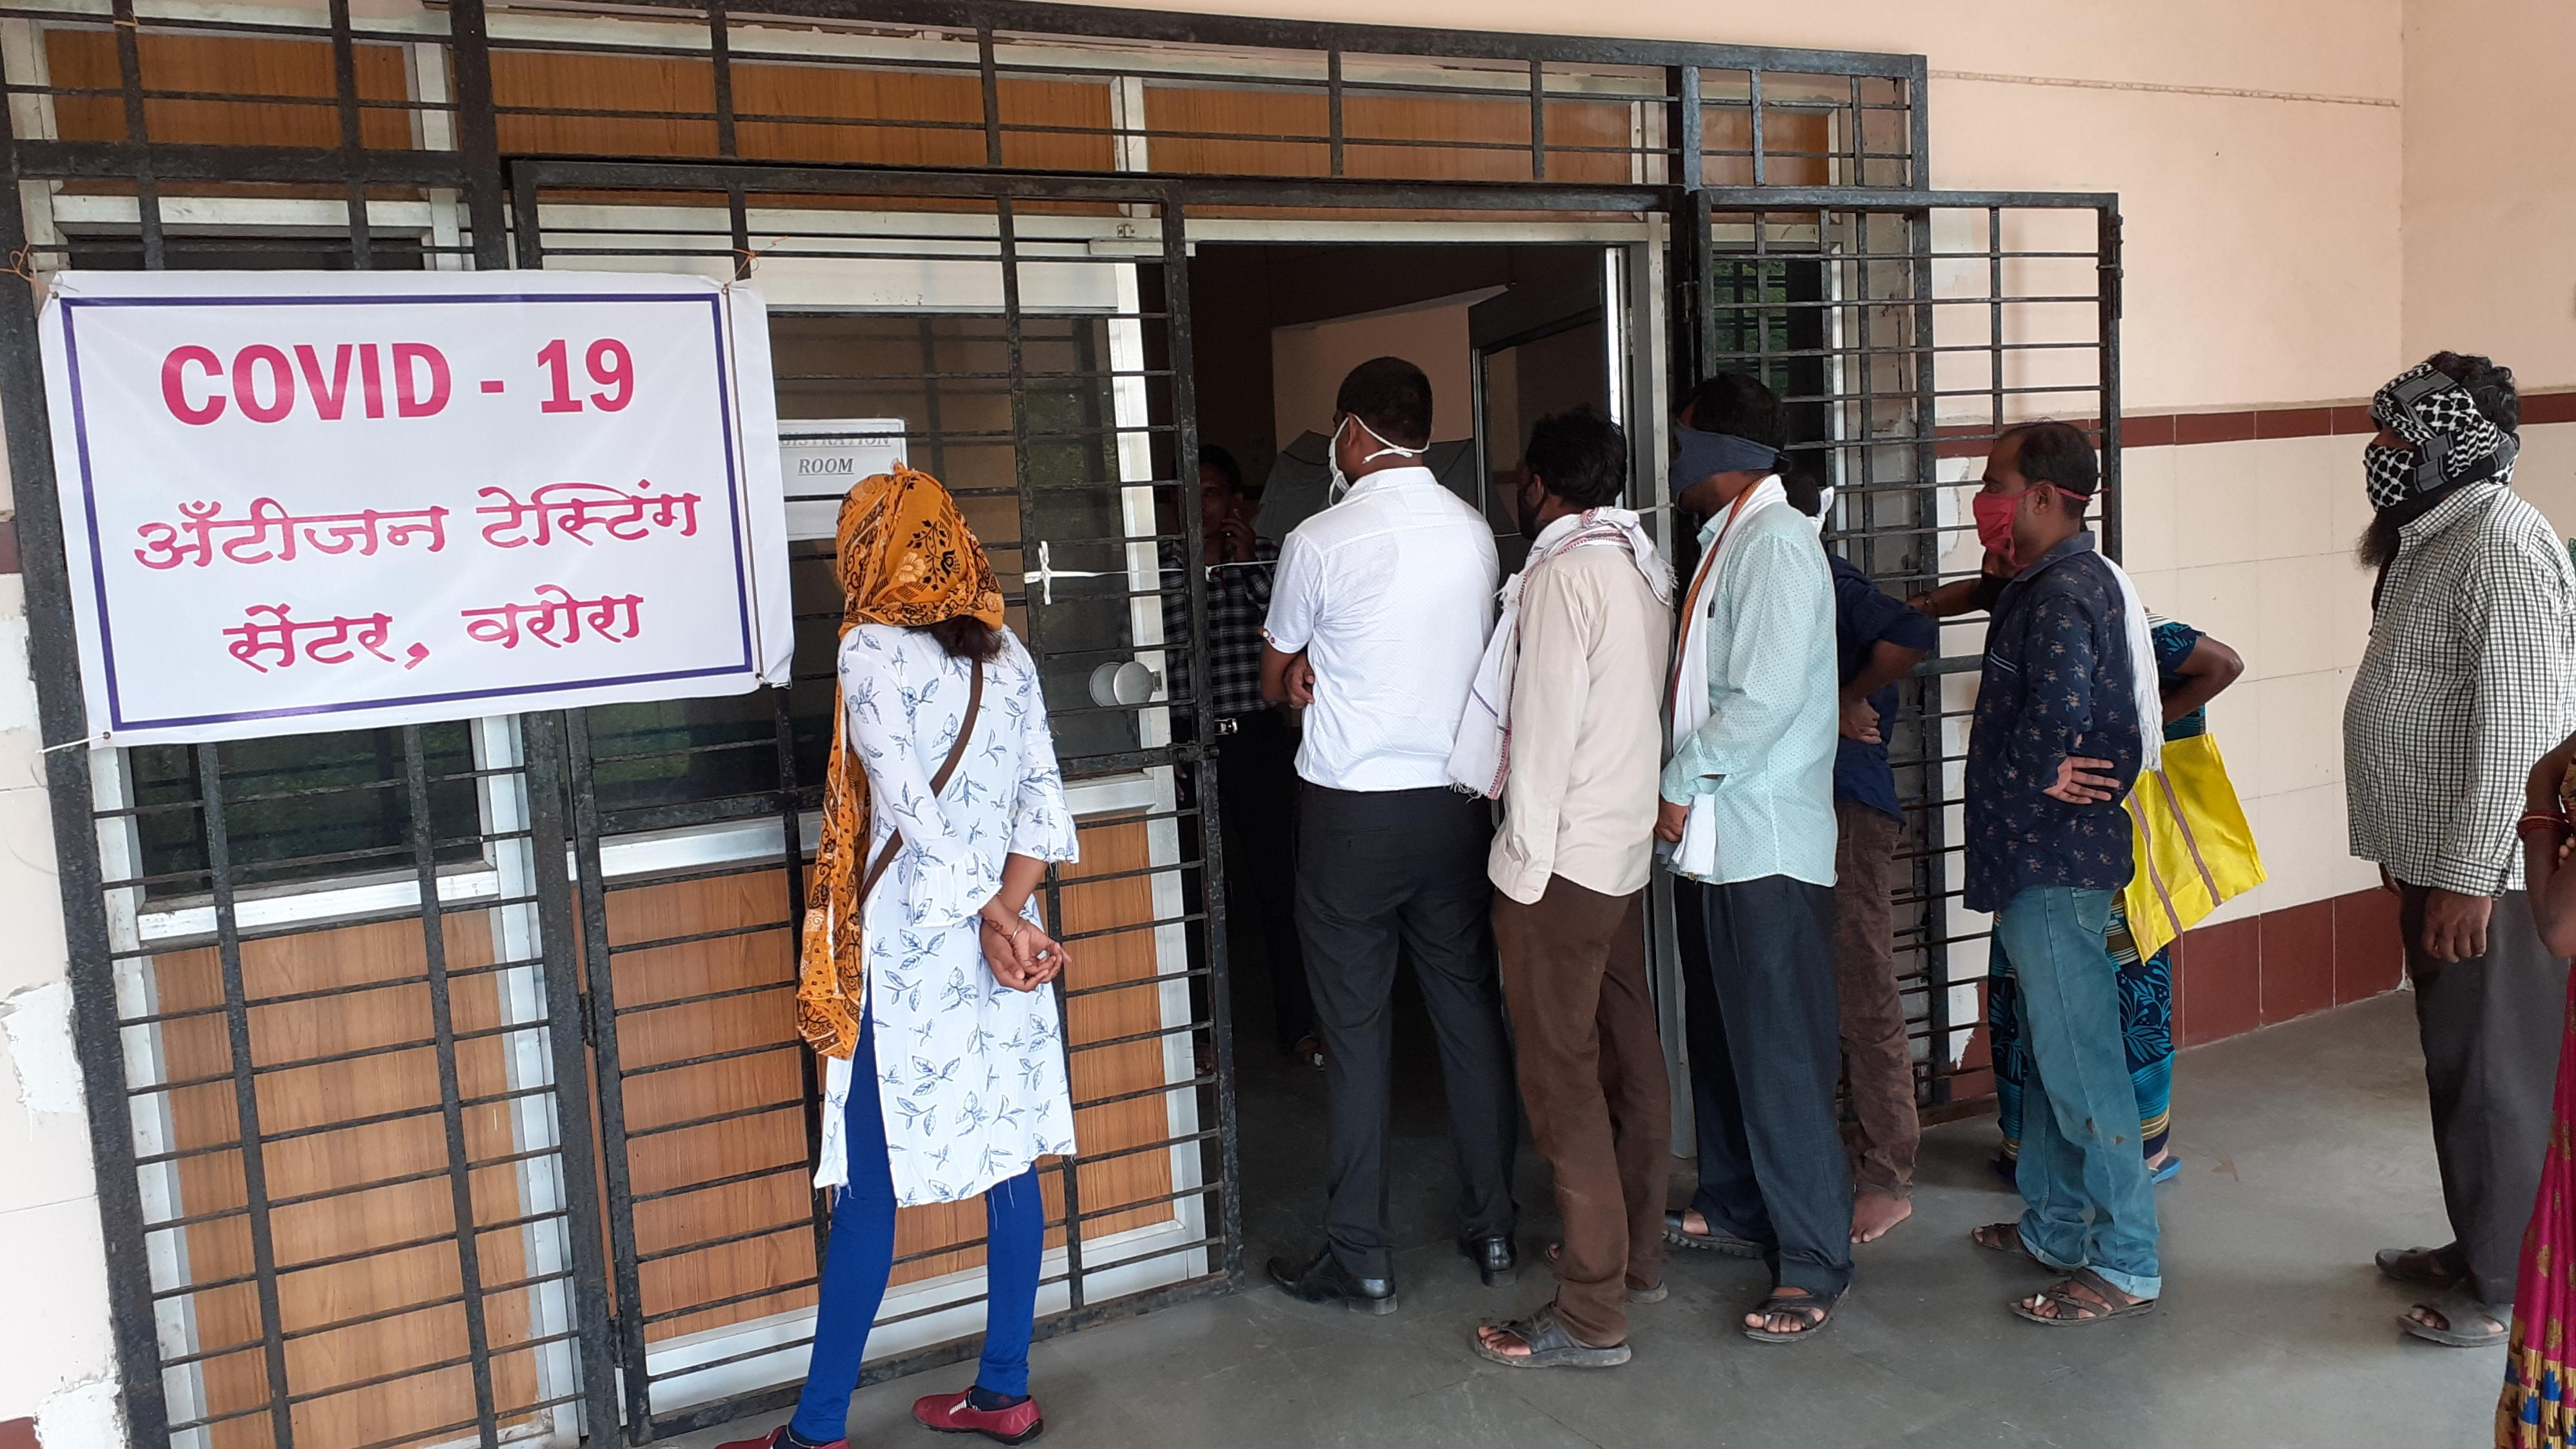 COVID-19 antigen testing centre Warora Maharashtra India. Ganesh Dhamodkar, CC BY-SA 4.0 <https://creativecommons.org/licenses/by-sa/4.0>, via Wikimedia Commons